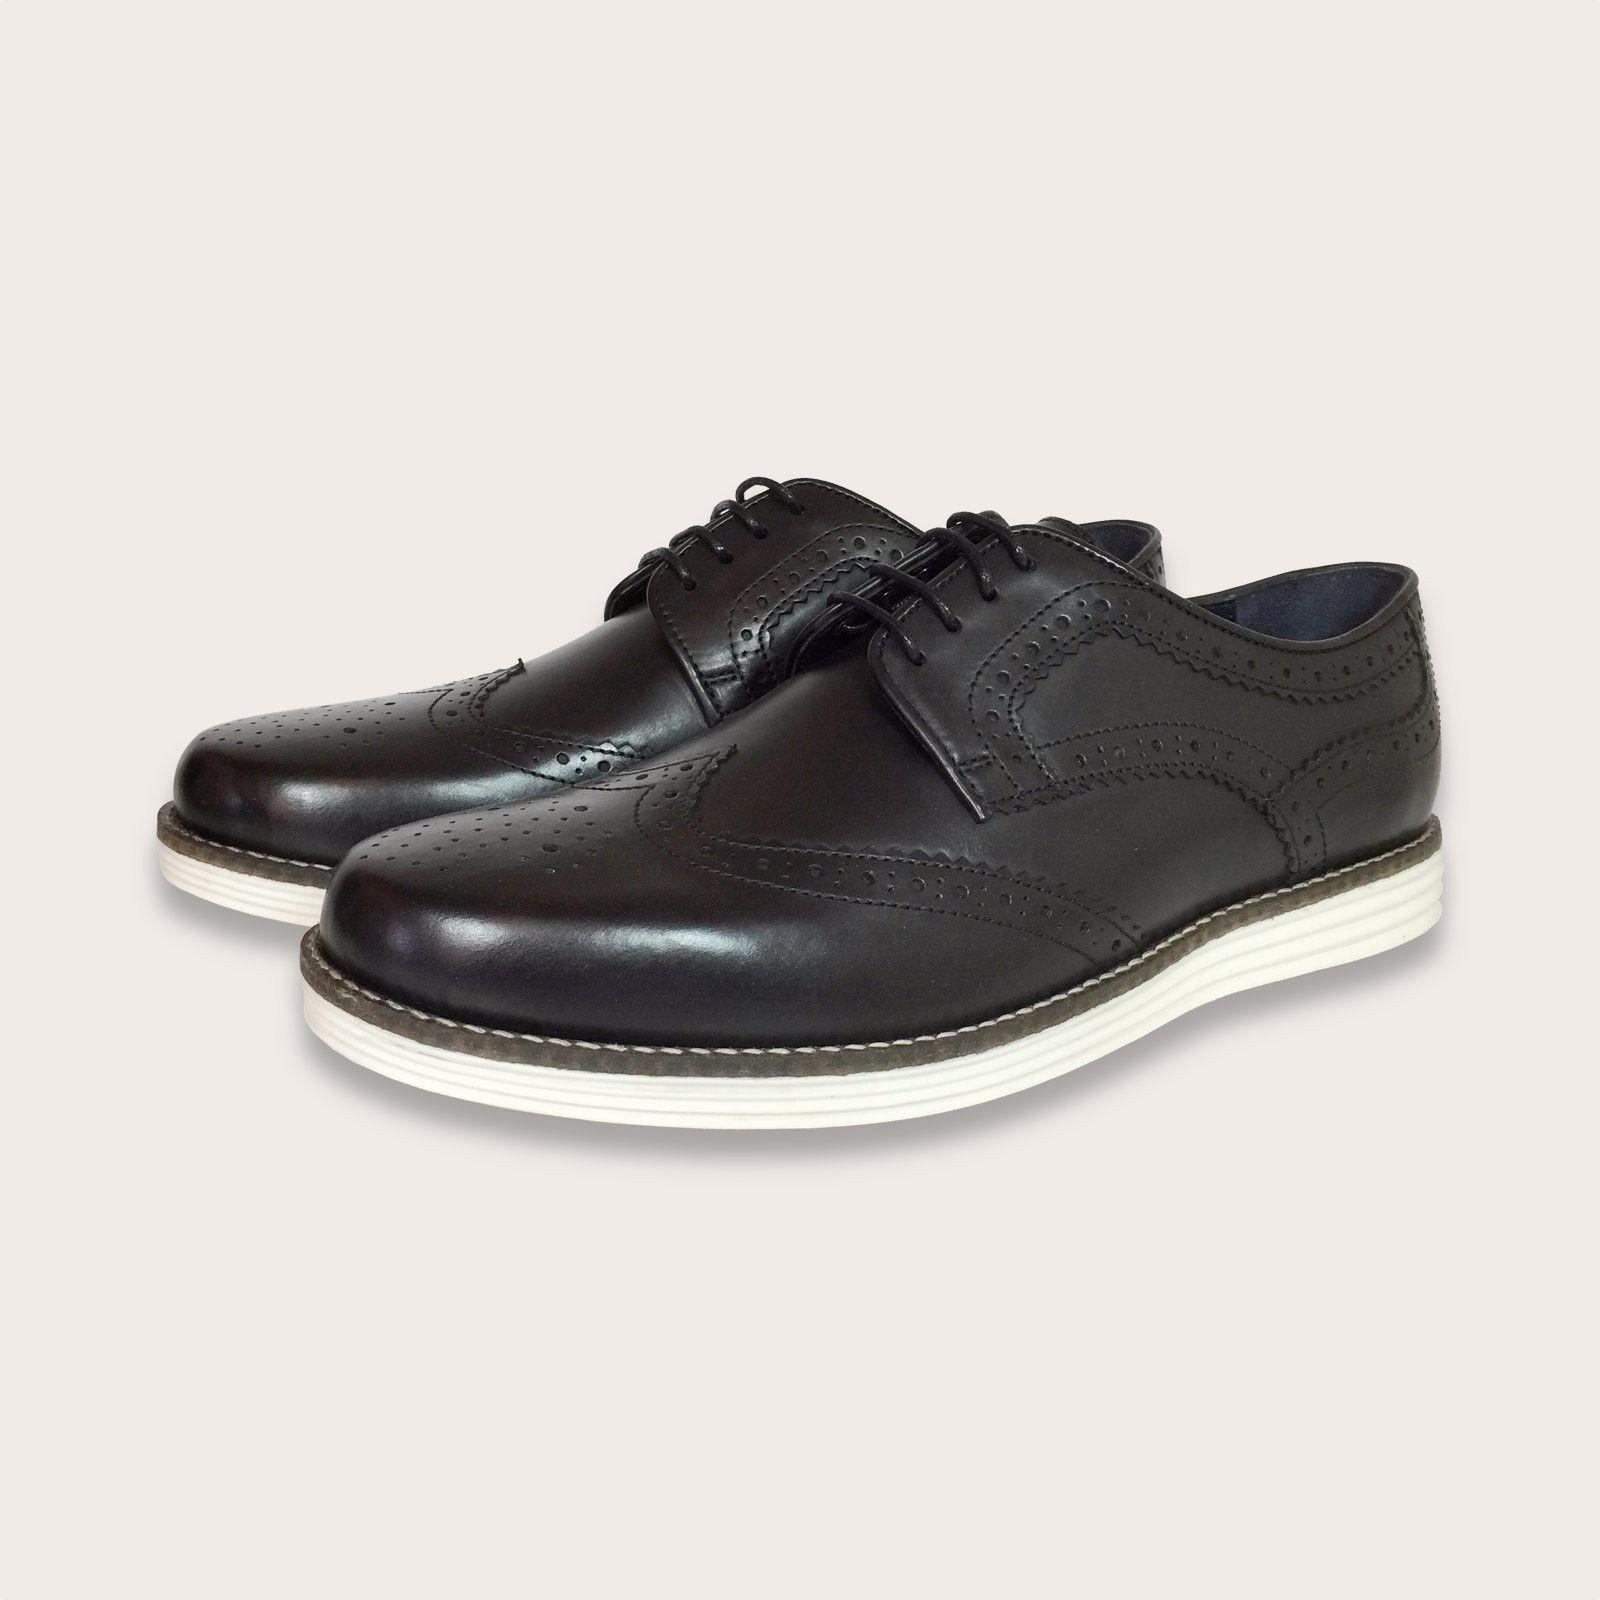 smart-casual-shoes.html | Black brogues